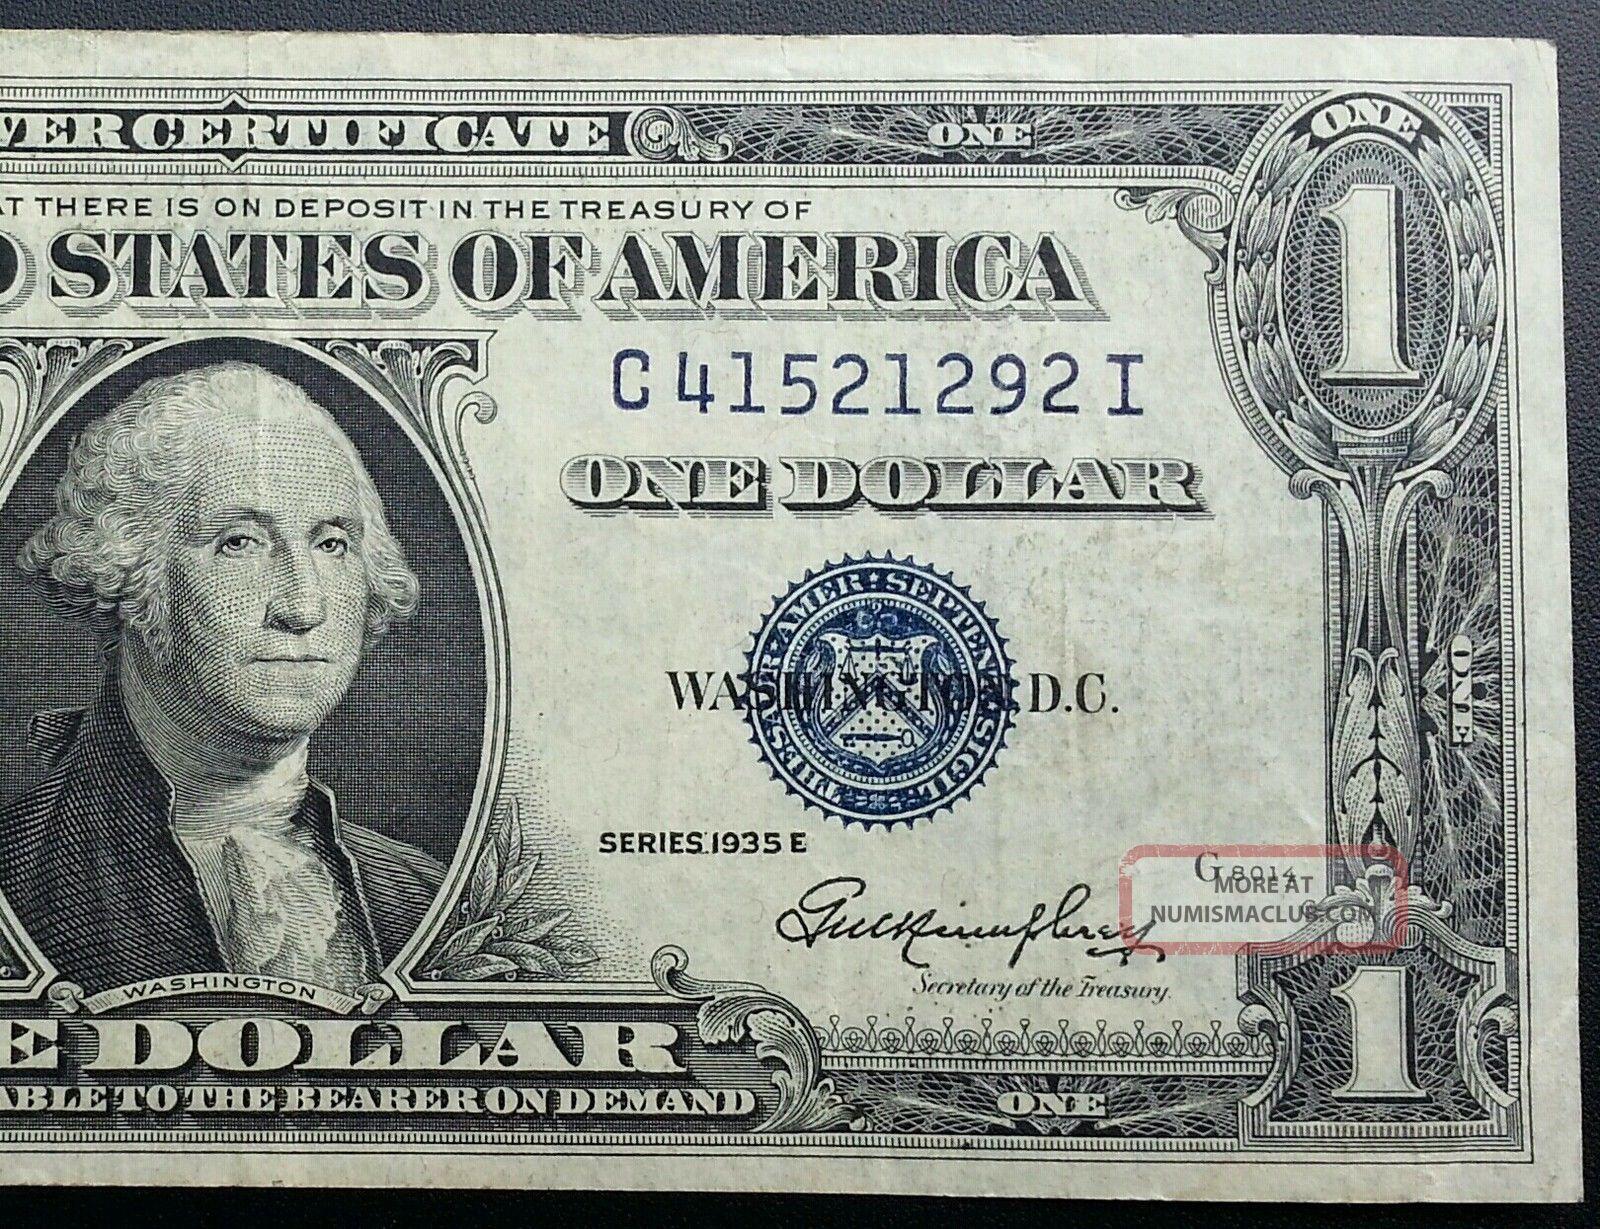 1935 E Silver Certificate Blue Label Seal One Dollar Bill